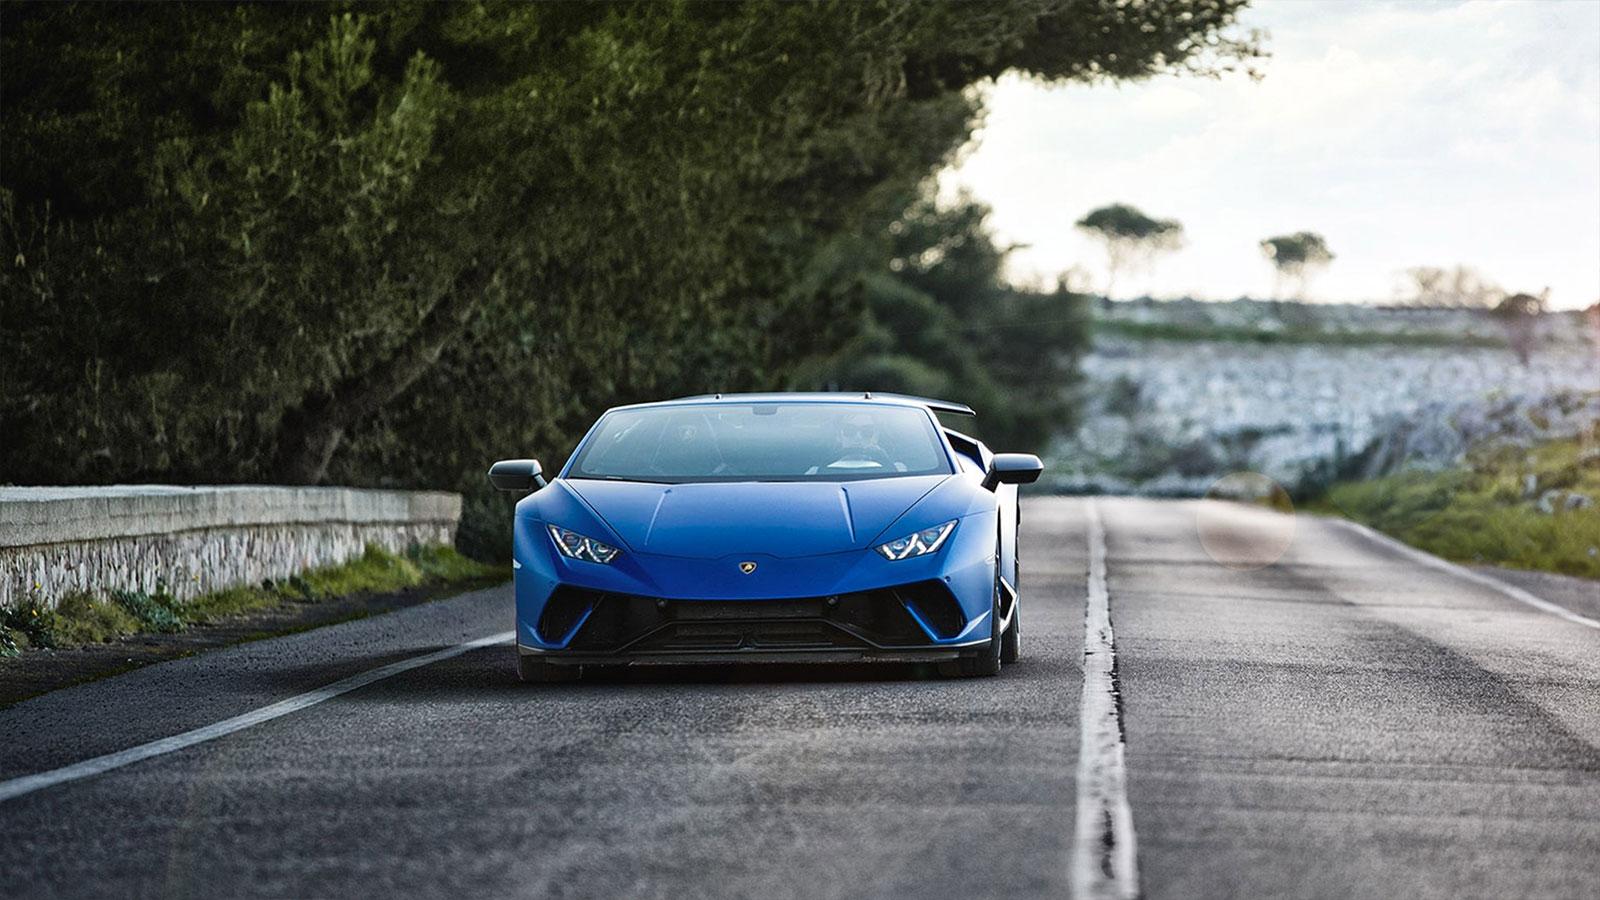 Lamborghini Huracan Performante Spyder - Vivid Technology image 3